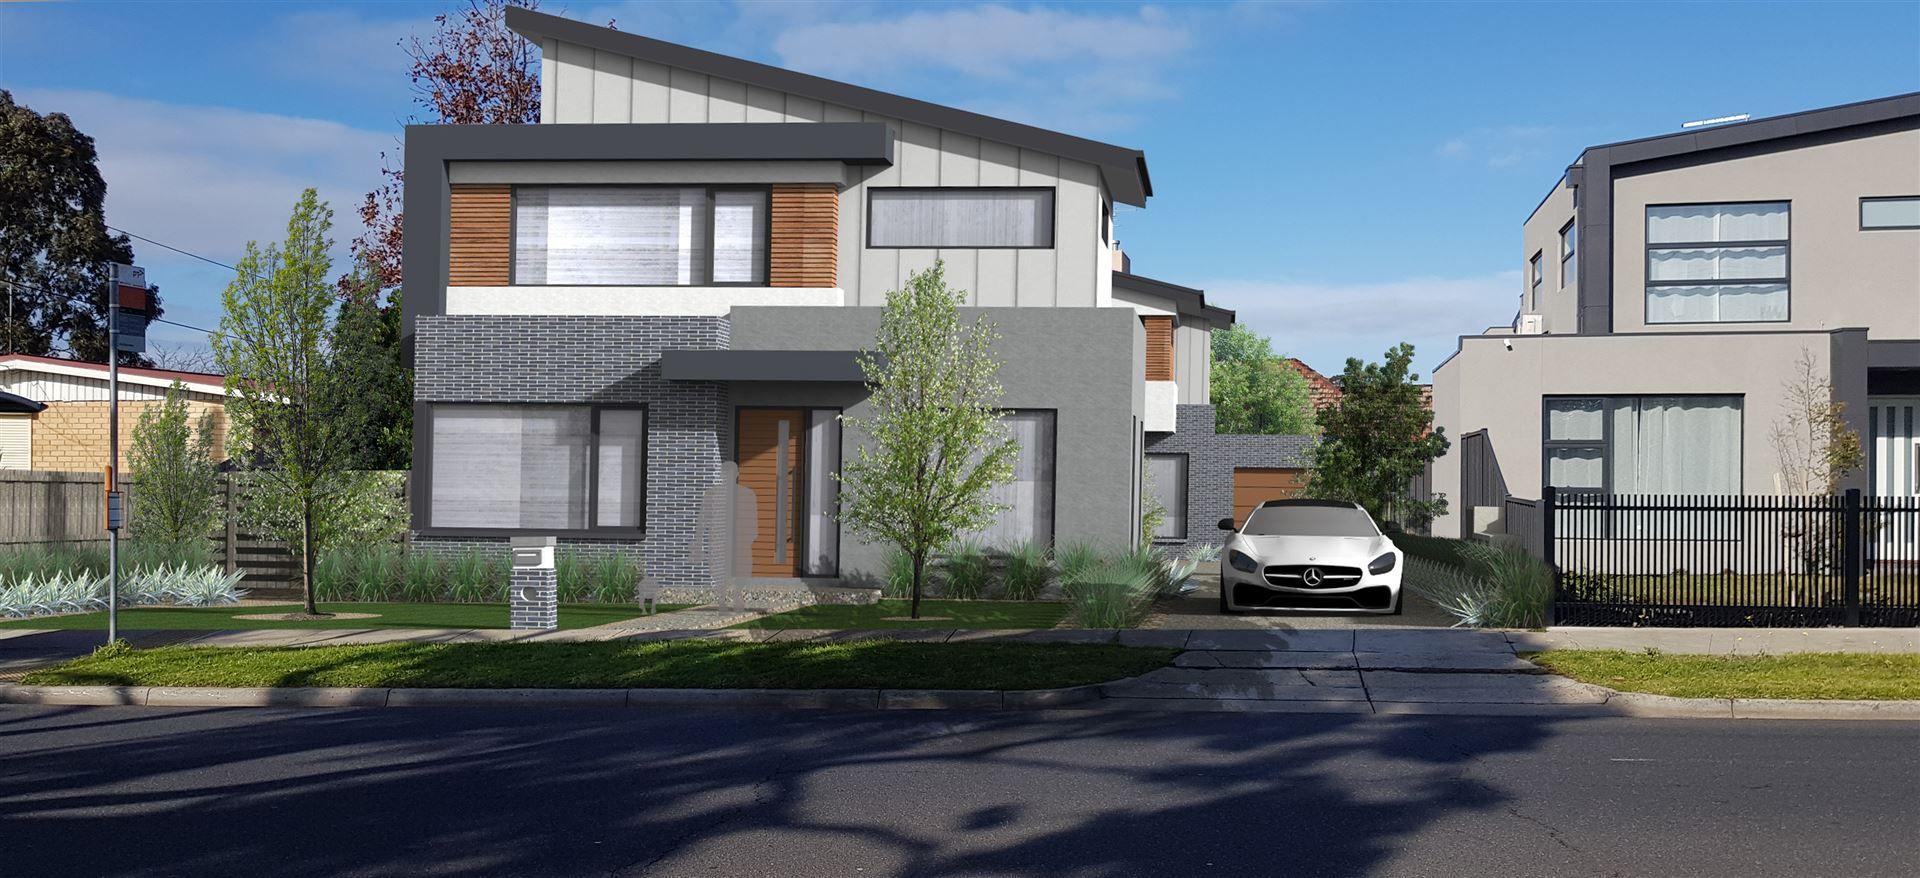 21 Woorite Place, Keilor East VIC 3033, Image 1